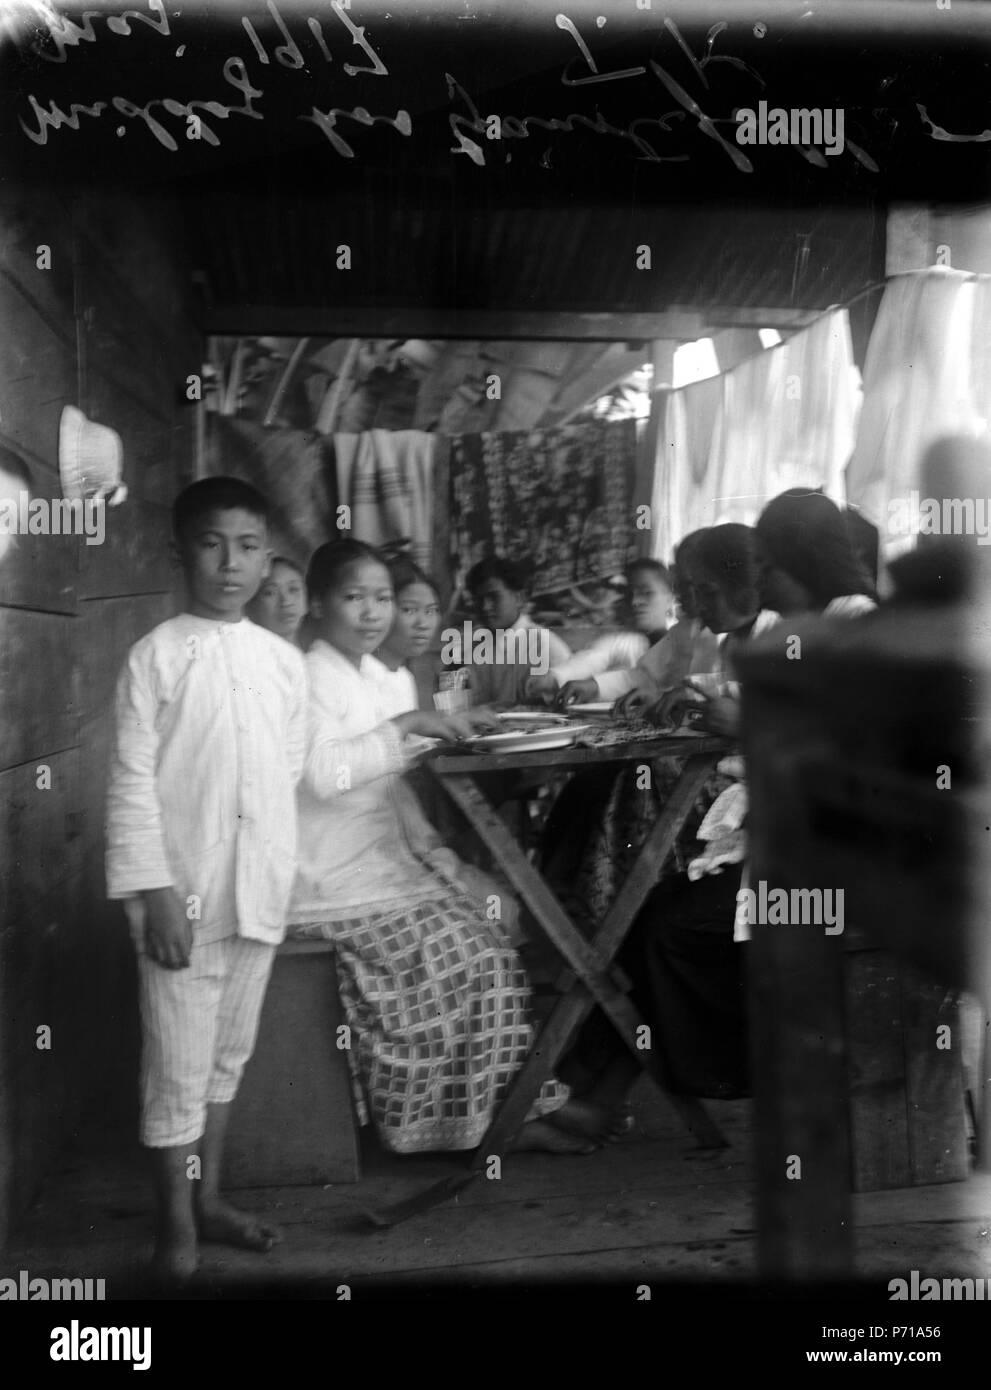 42 Middagskalas hos tjänstefolket. Sulawesi. Indonesien - SMVK - 022116 - Stock Image